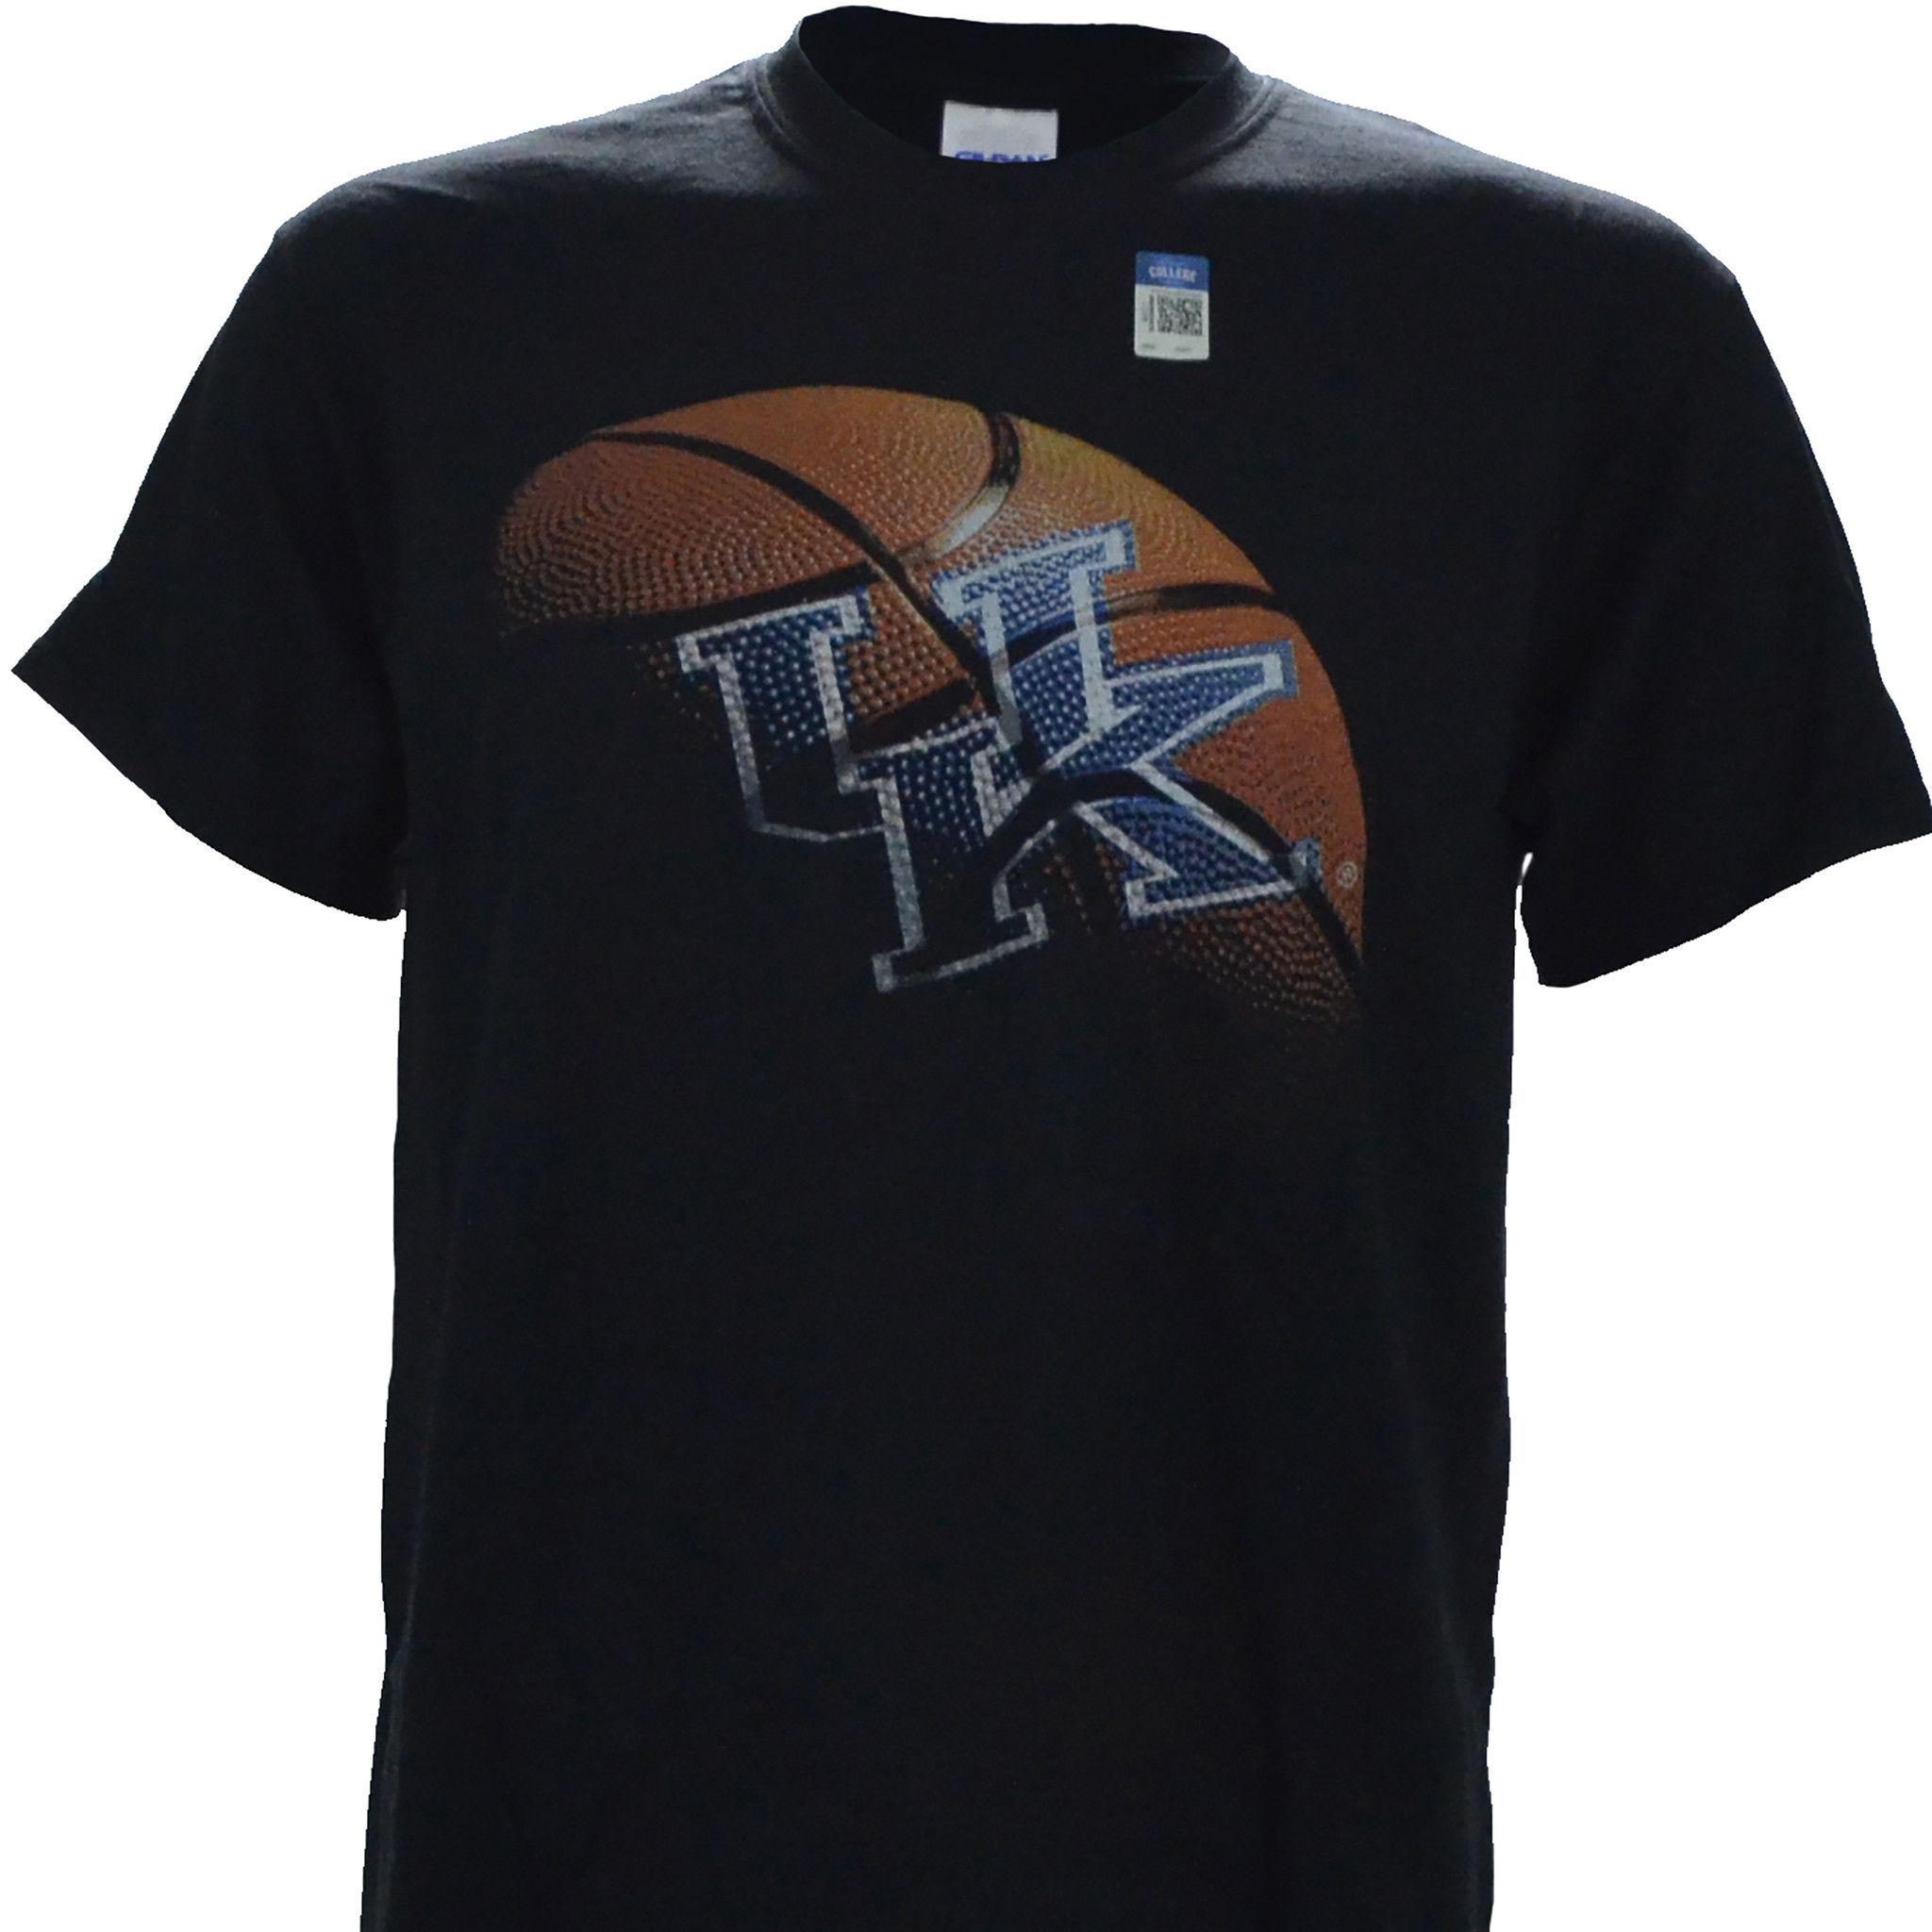 University of Kentucky UK REAL BALL on a Black Short Sleeve T Shirt